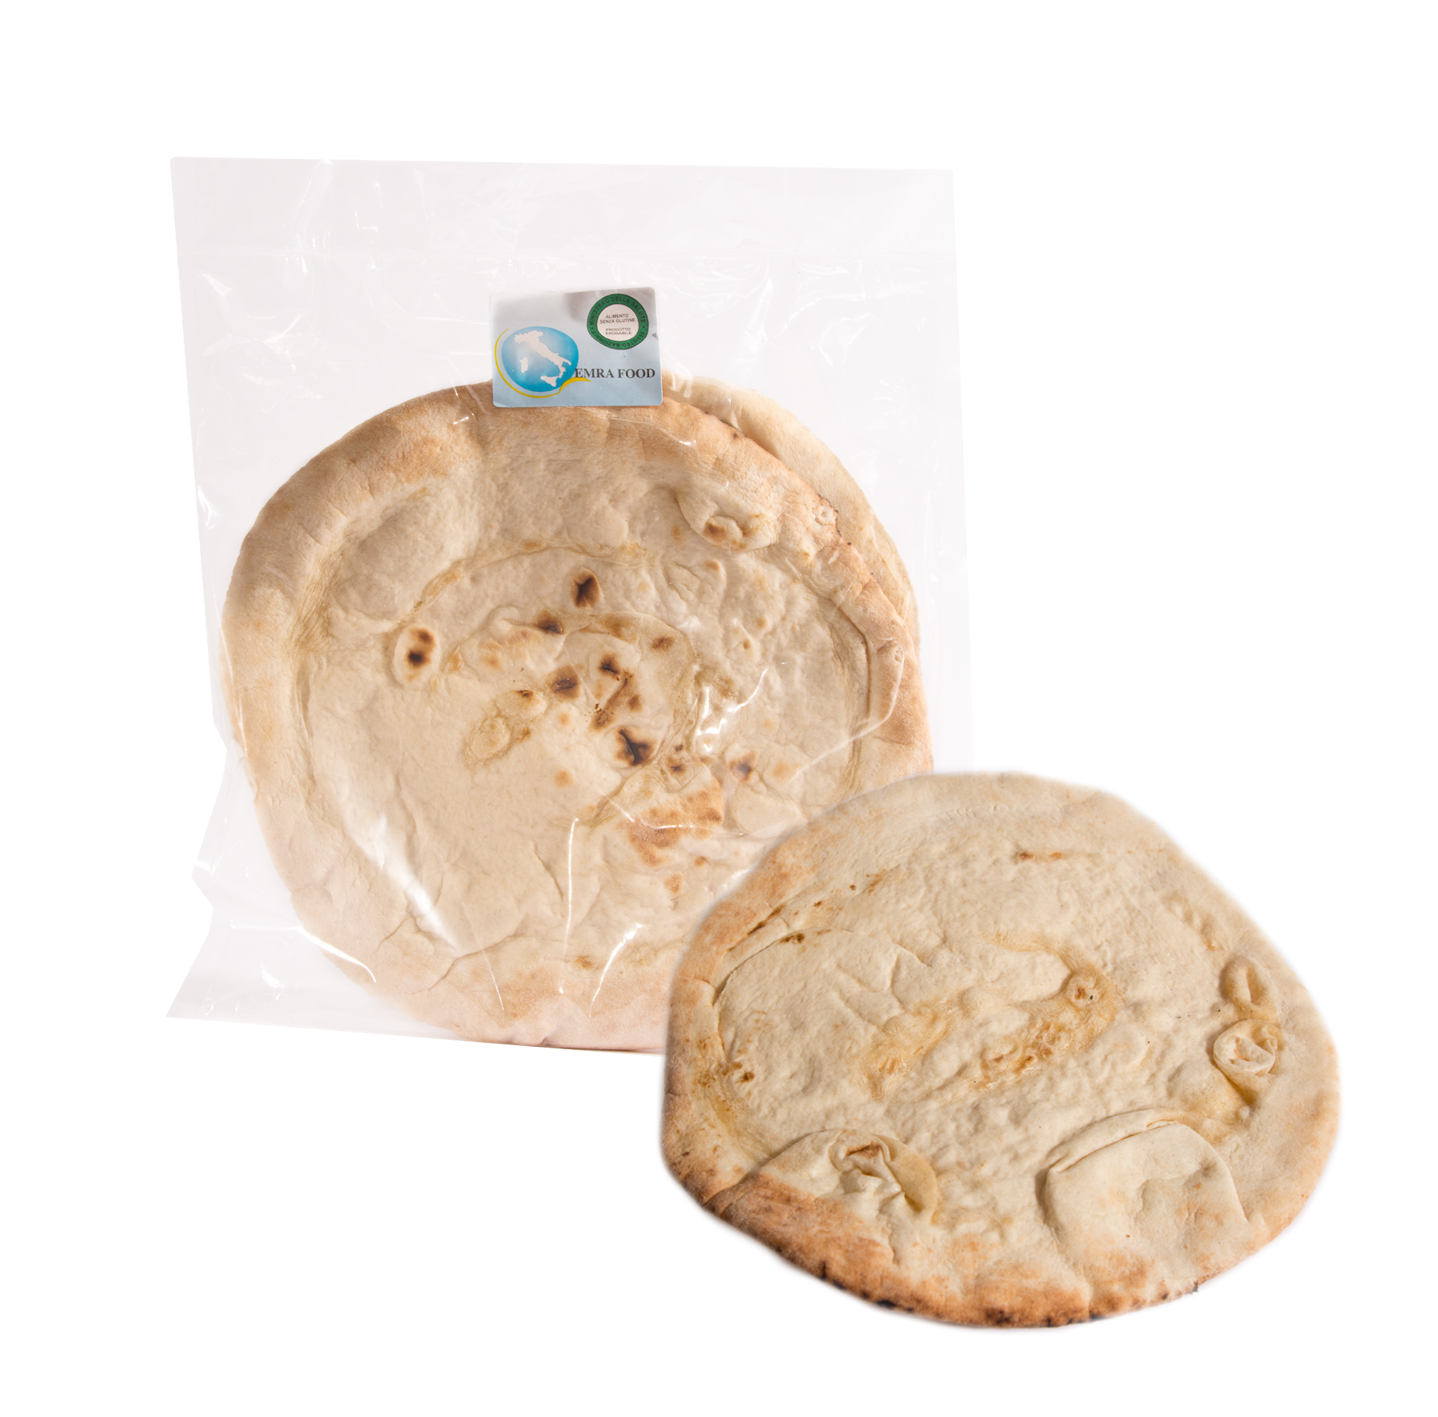 Image of Emra Food Pane Saltimbocca Tondo Senza Glutine Senza Lattosio 1x180g 971115959